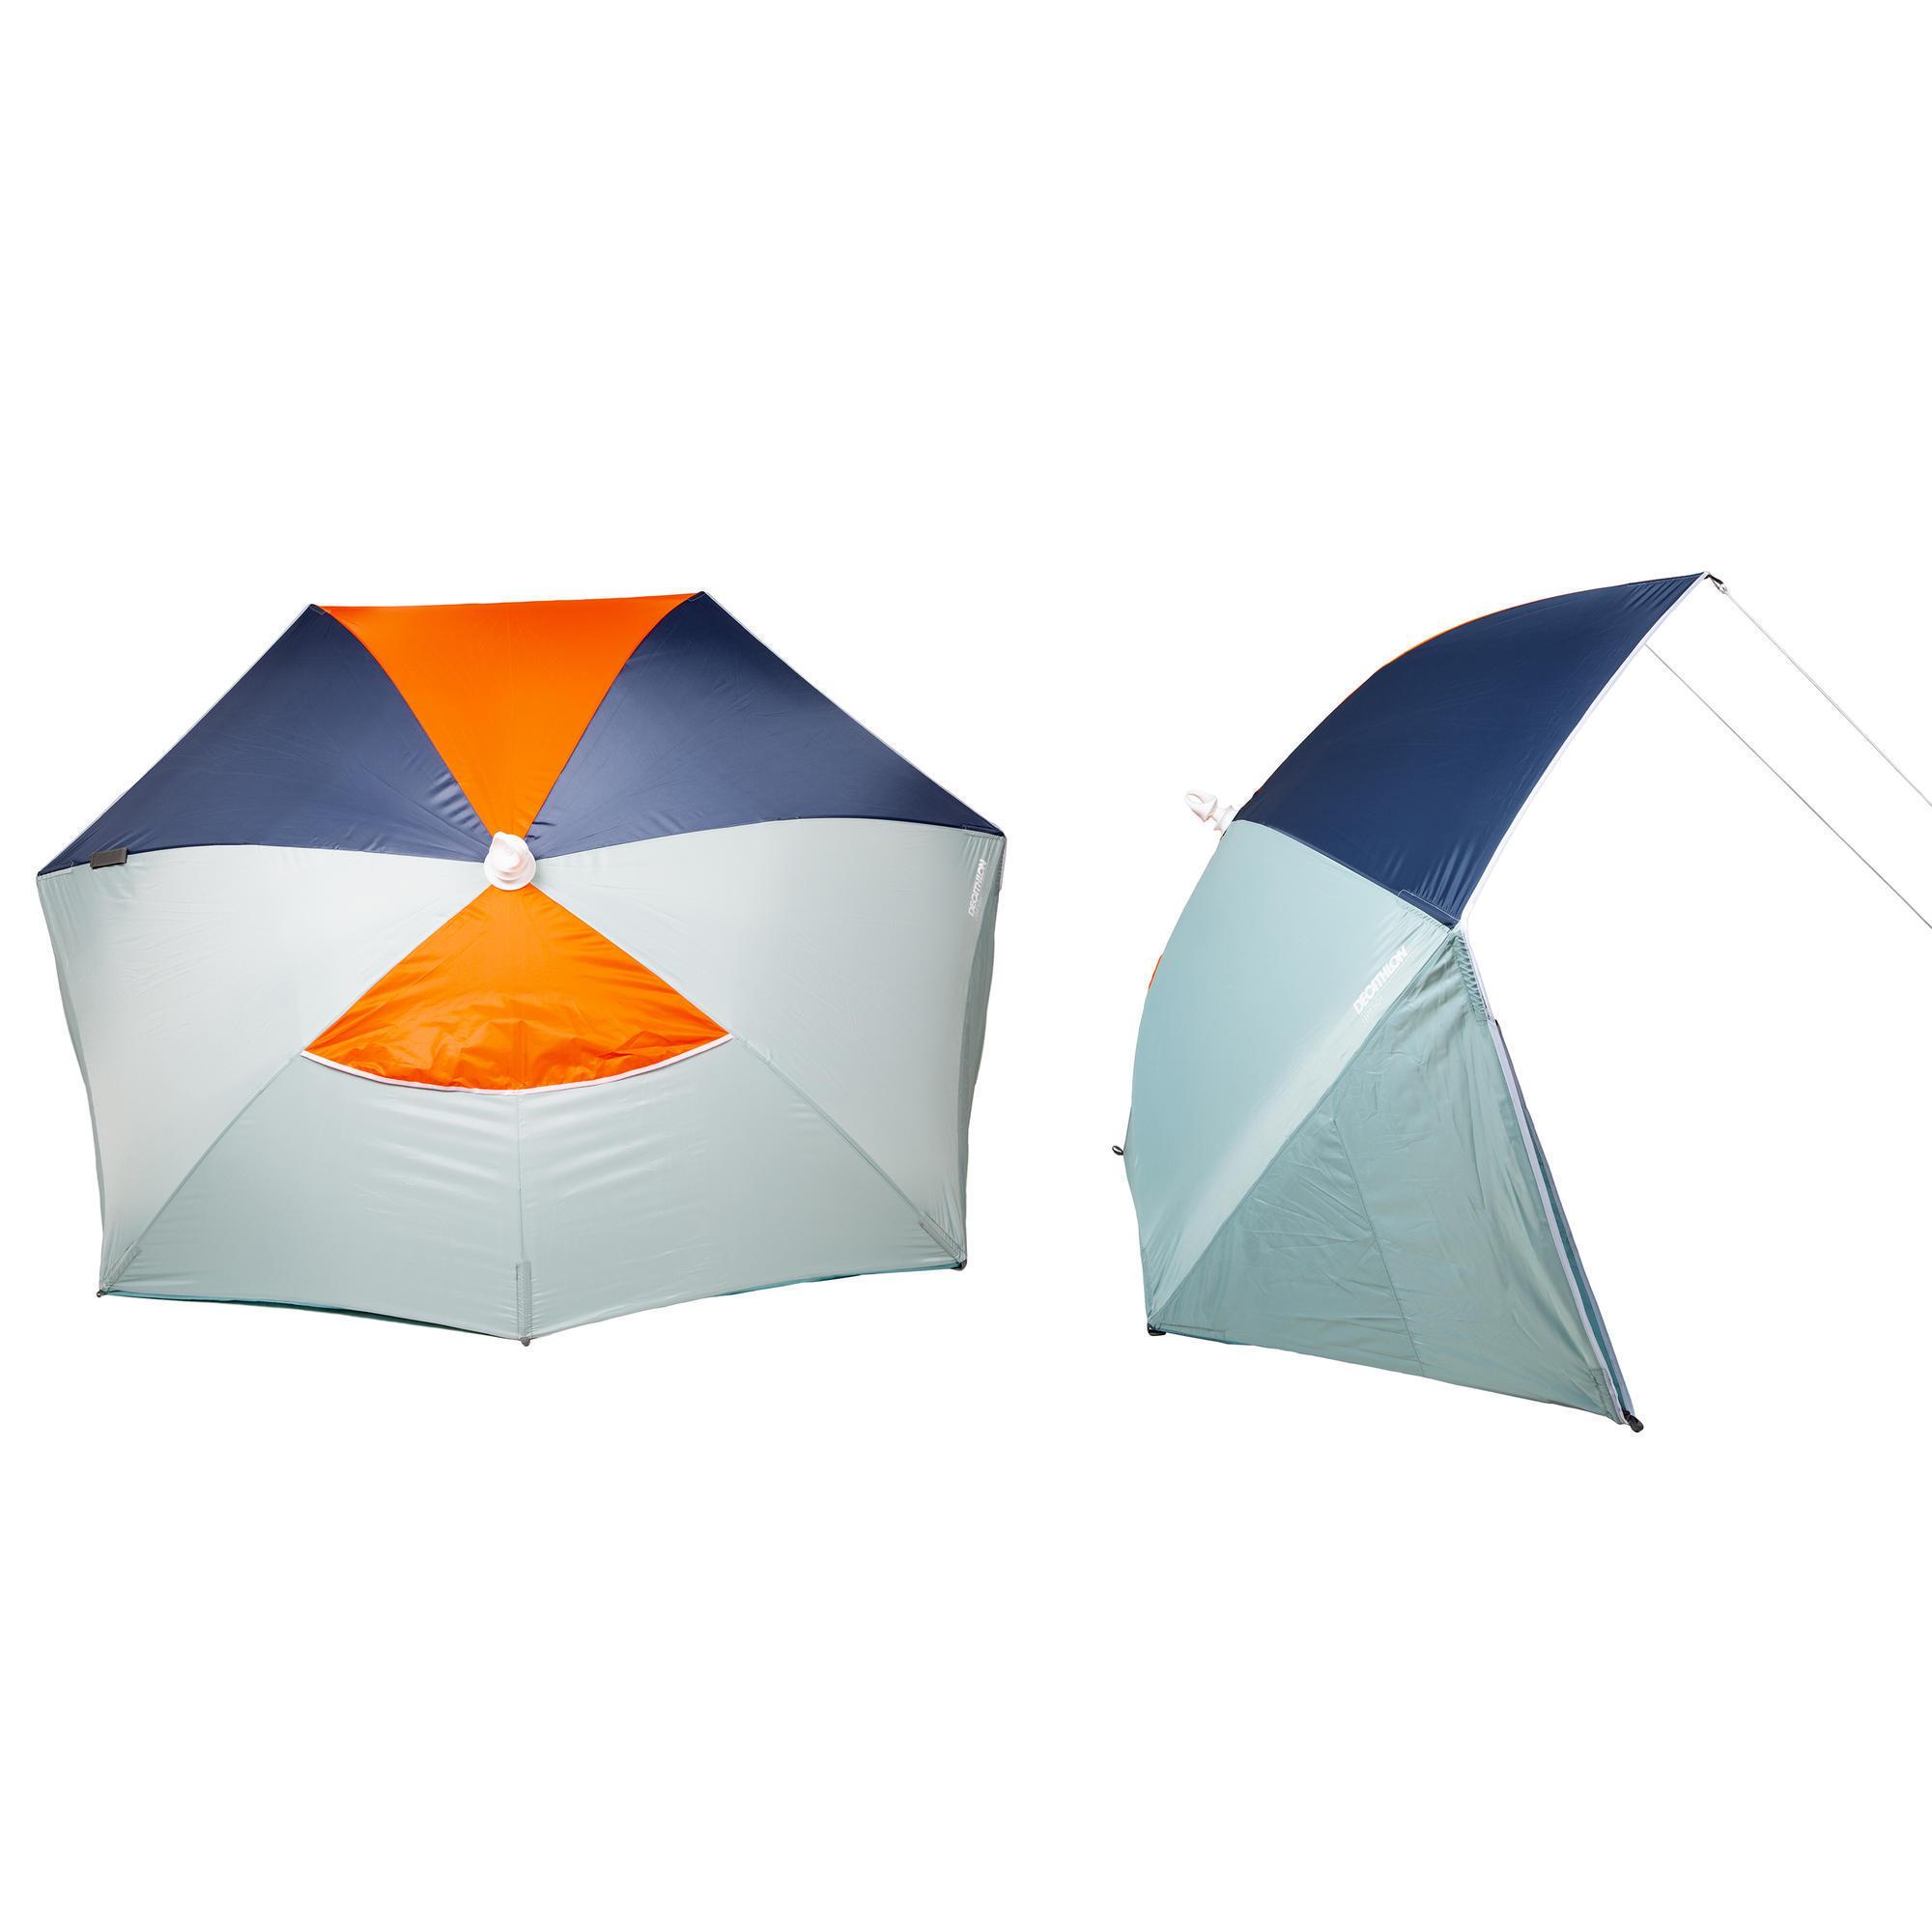 Tente Anti Uv Et Parasol Anti Uv Decathlon